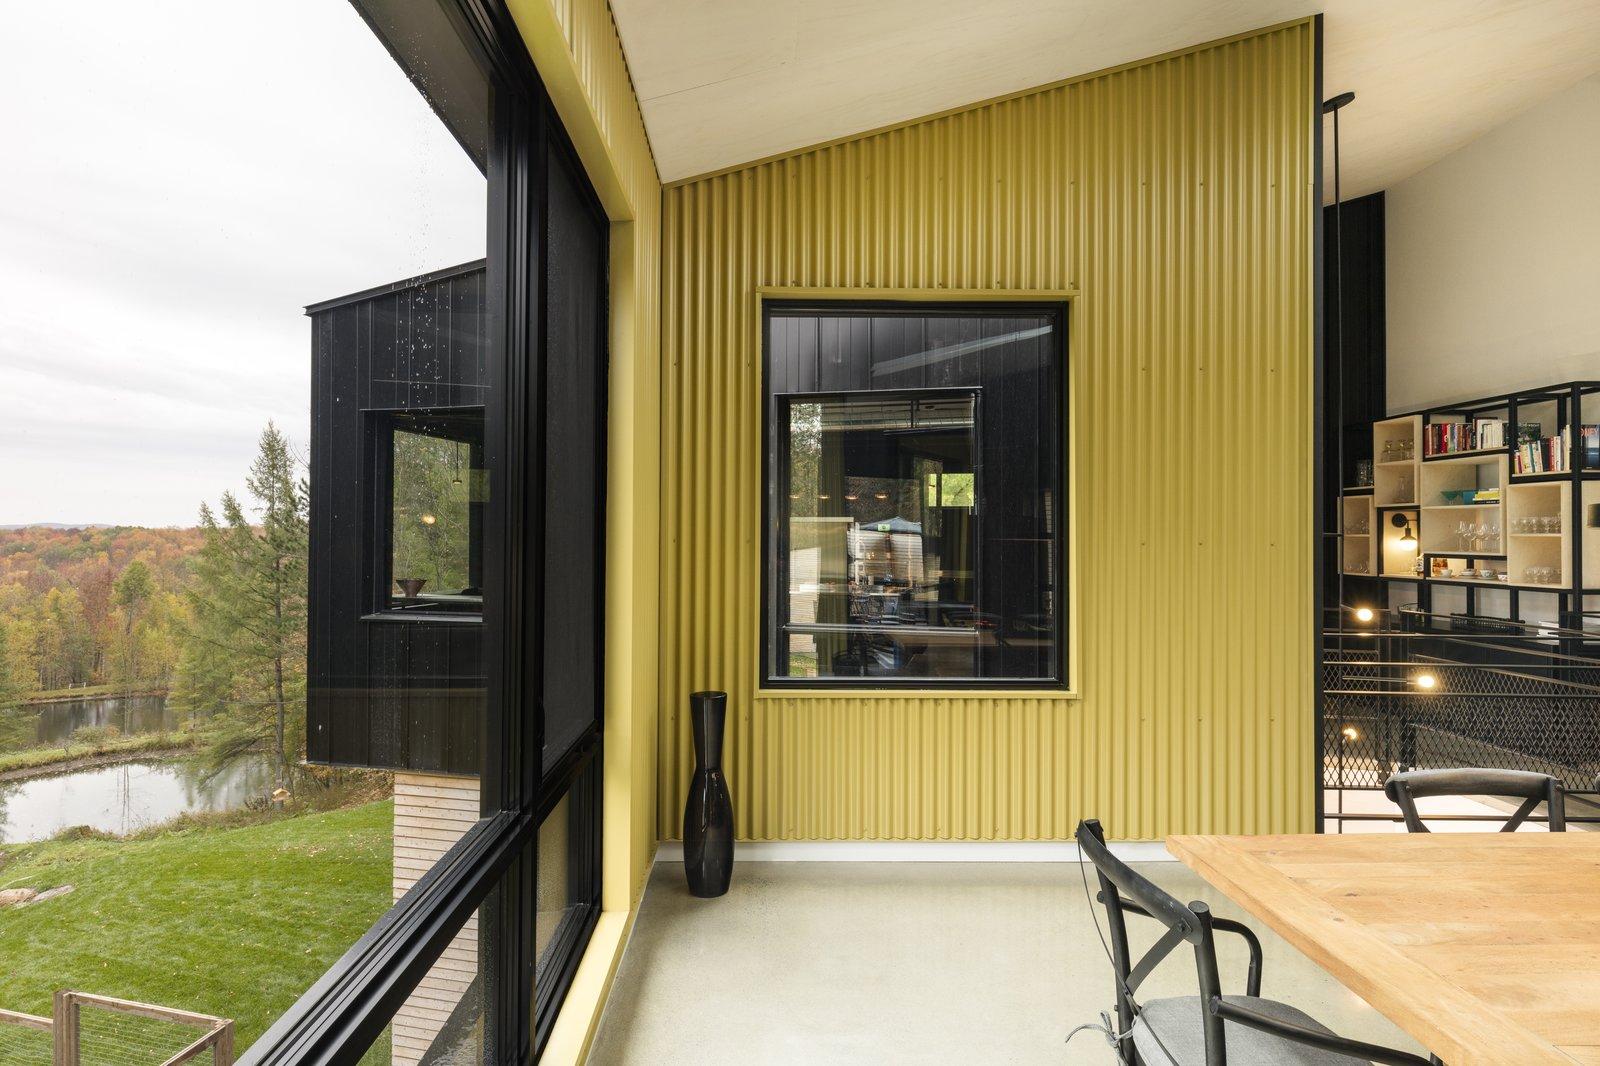 Abercorn Chalet interior with floor-to-ceiling windows